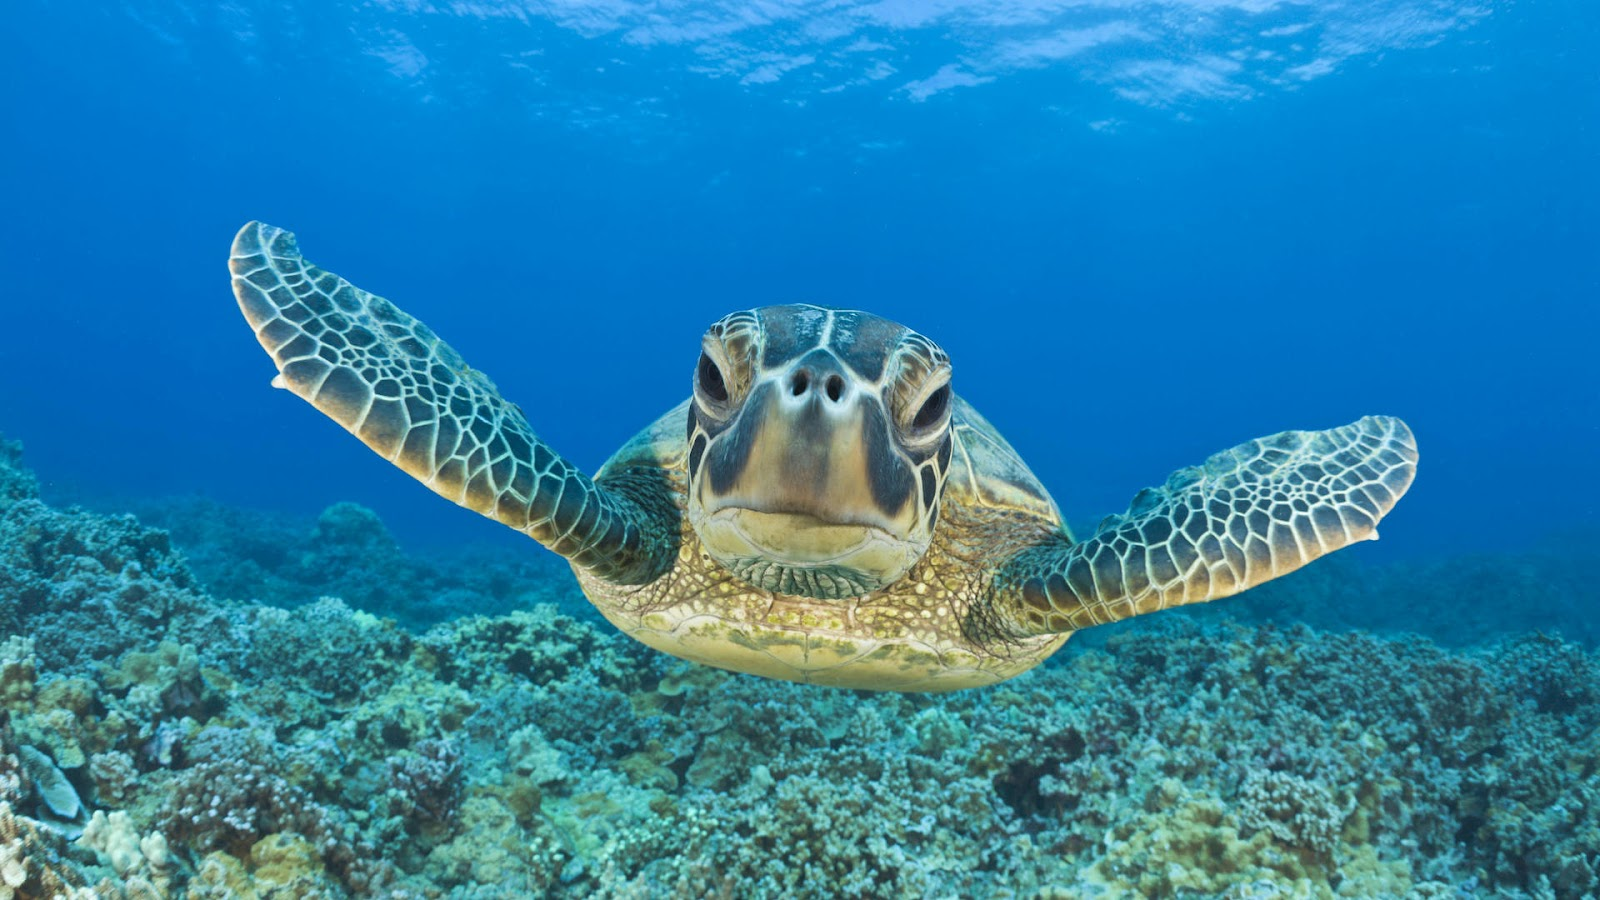 turtle swimming underwater hd animal wallpaper turtlesjpg 1600x900